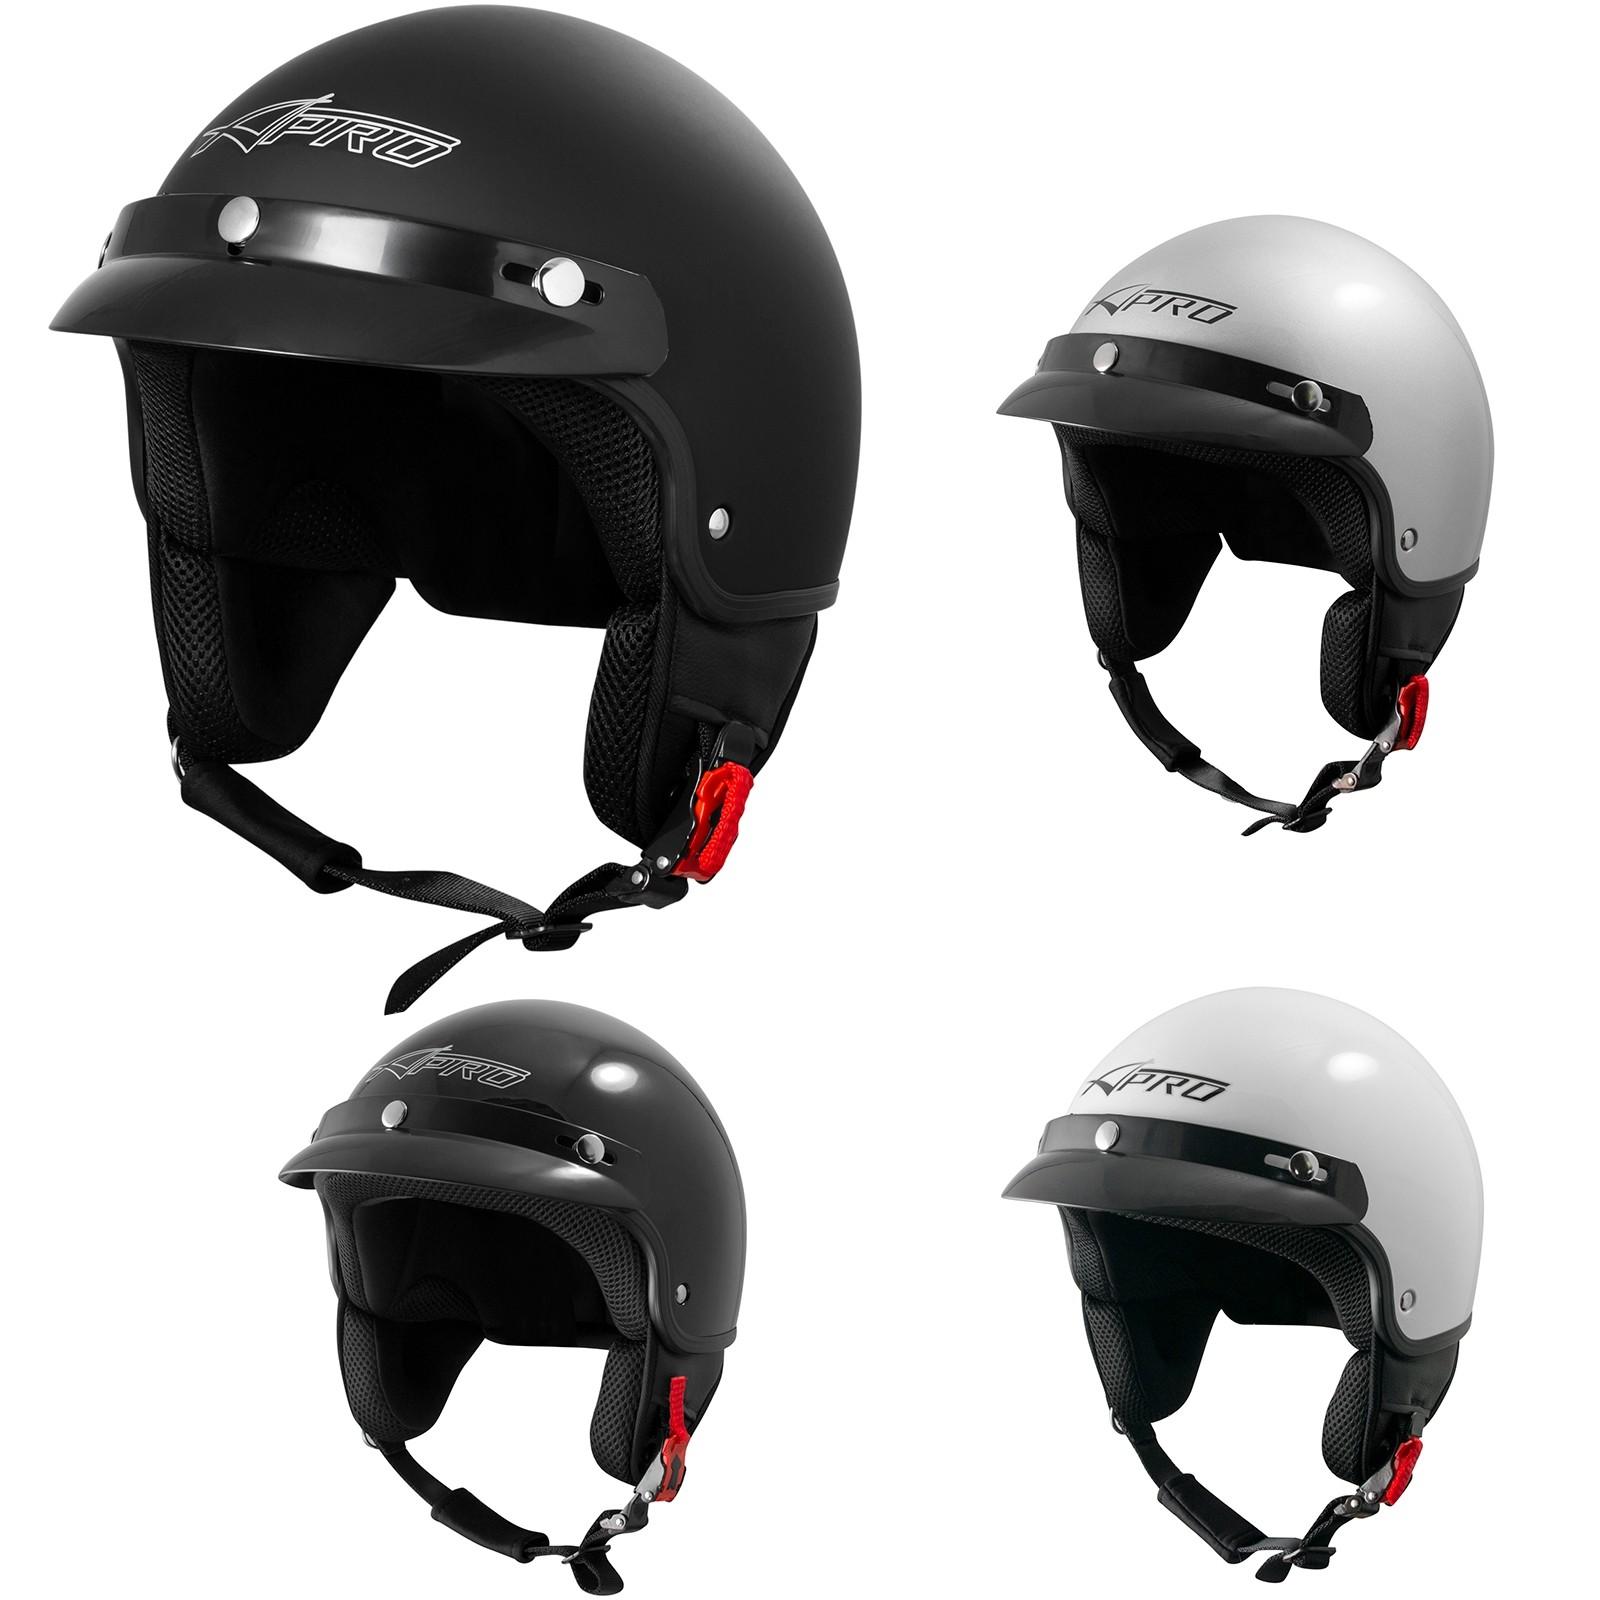 Gravity-Casco-Jet-Helmet-Motorcycle-Sonic-Moto-A-Pro-Set